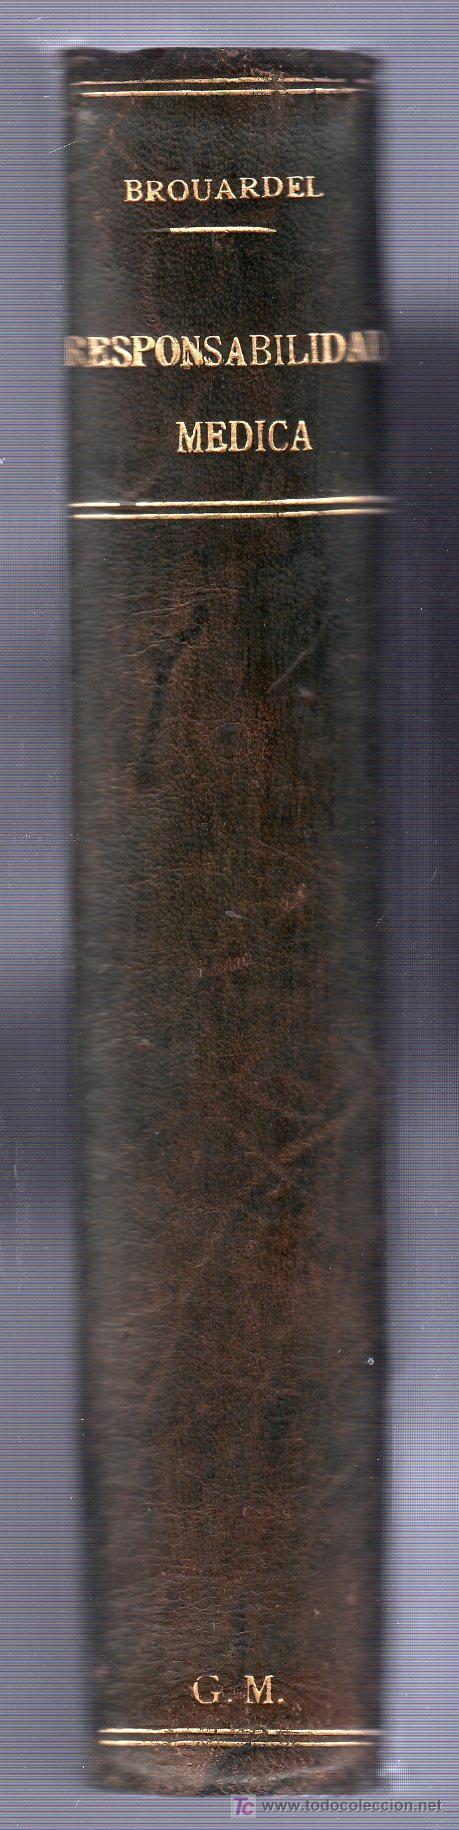 Libros antiguos: RESPONSABILIDAD MEDICA POR P. BROUARDEL. LIBRAIRIE J.B. BAILLIERE ET FILS. PARIS 1898 - Foto 2 - 15573533